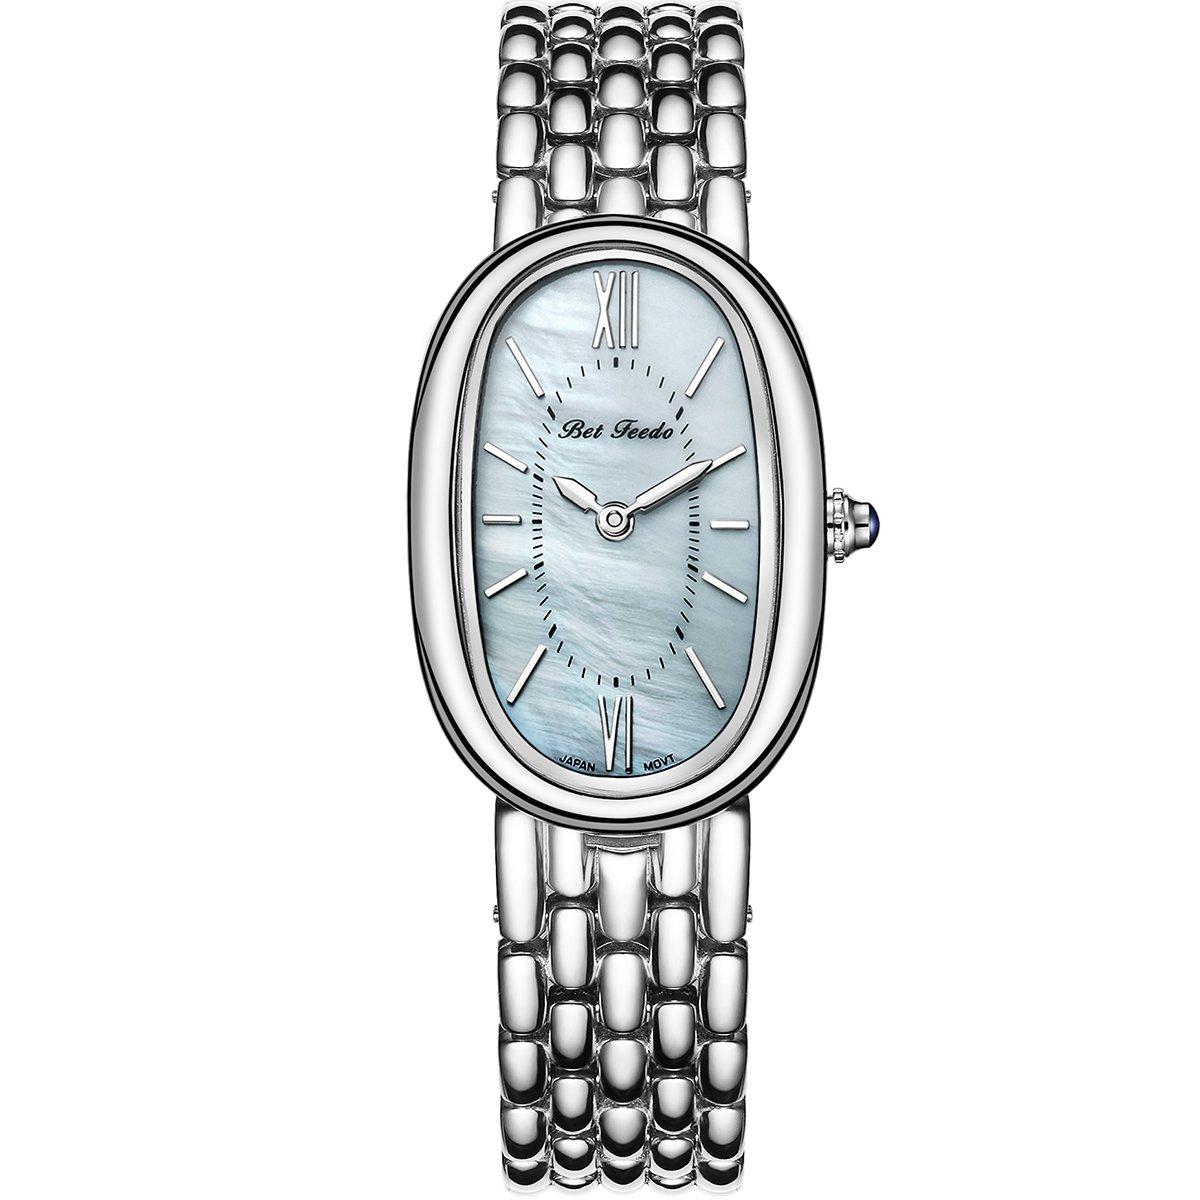 Wrist Watch for Women, Rosegold Fashion Dress Quartz Watch, BETFEEDO Waterproof Analog Watch (White)